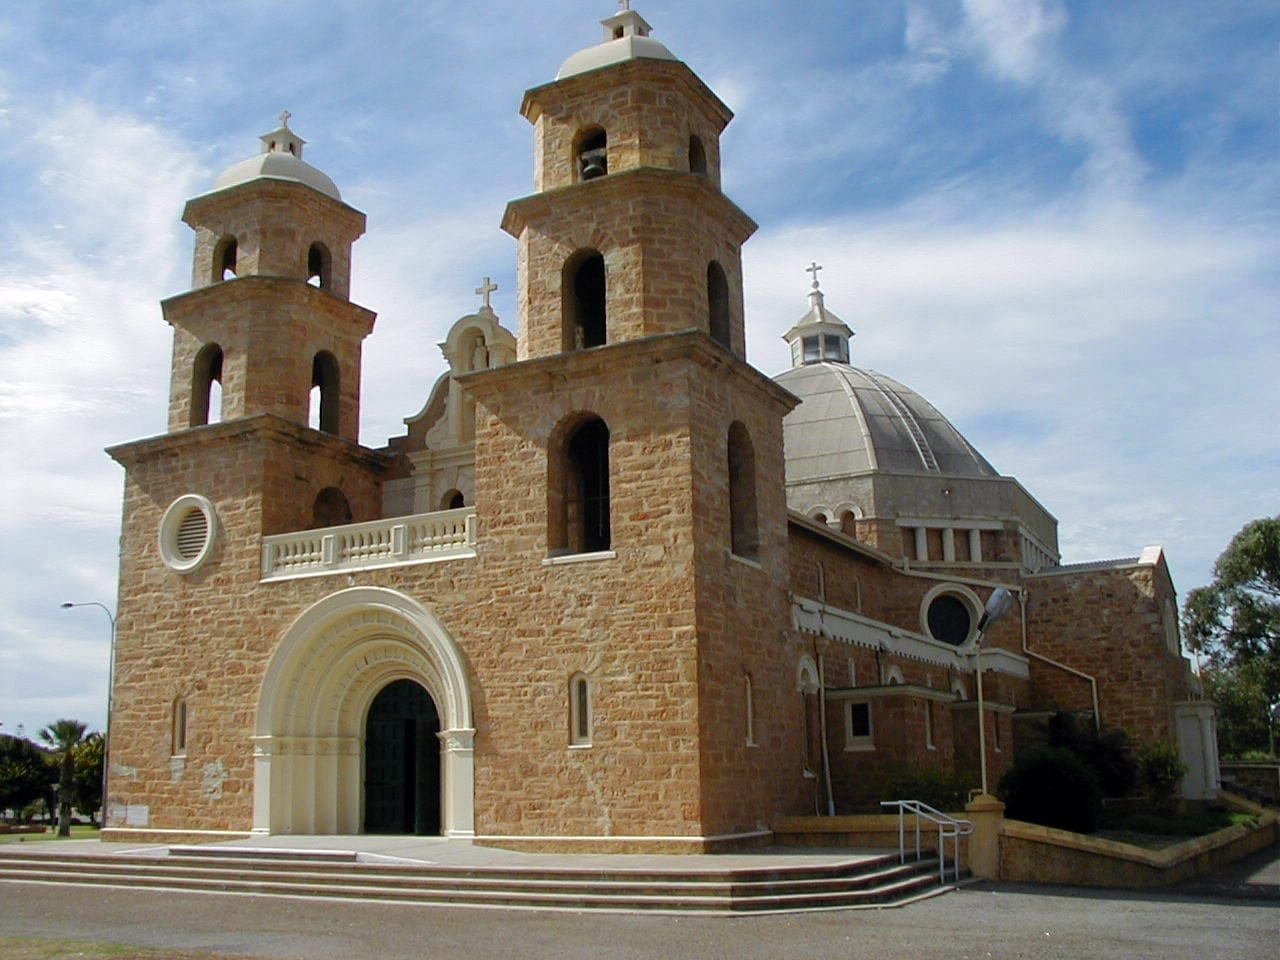 La catedral de San Francisco Javier Geraldton Australia